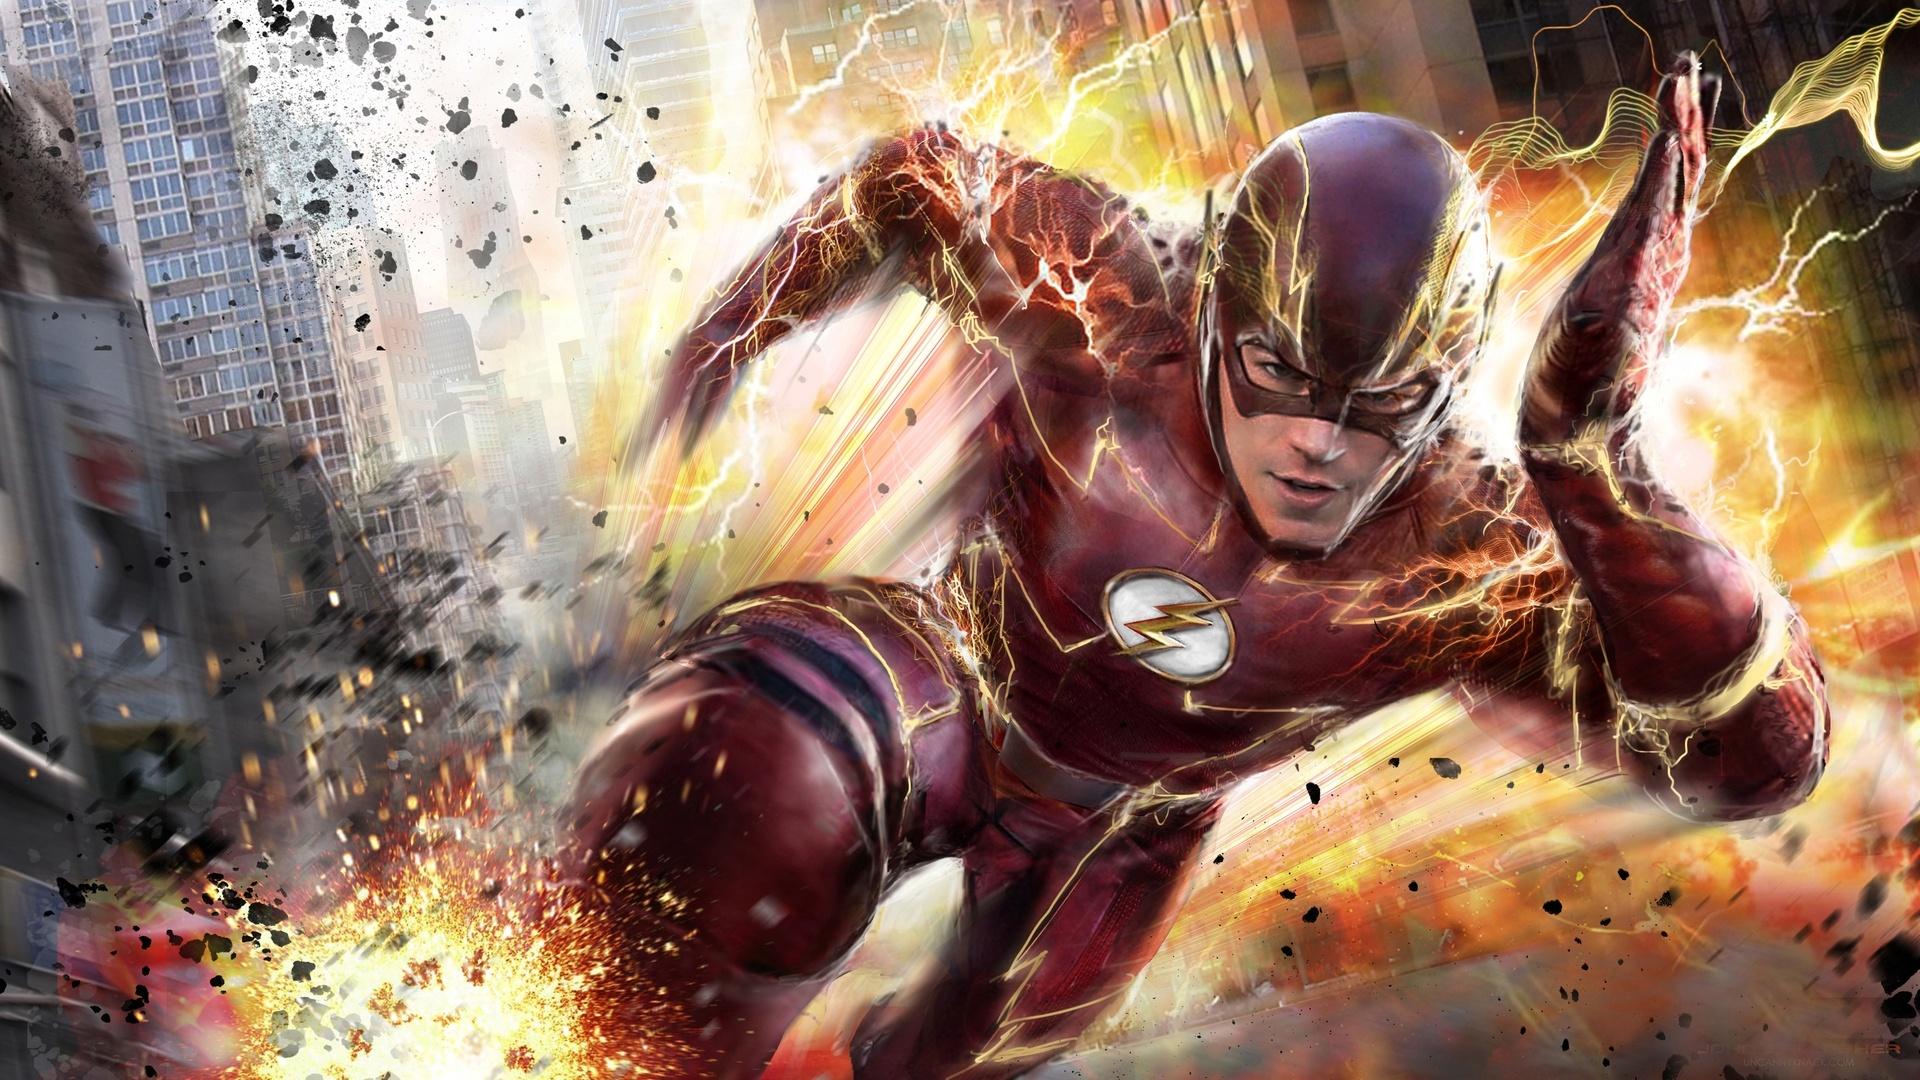 The Flash desktop wallpaper free download